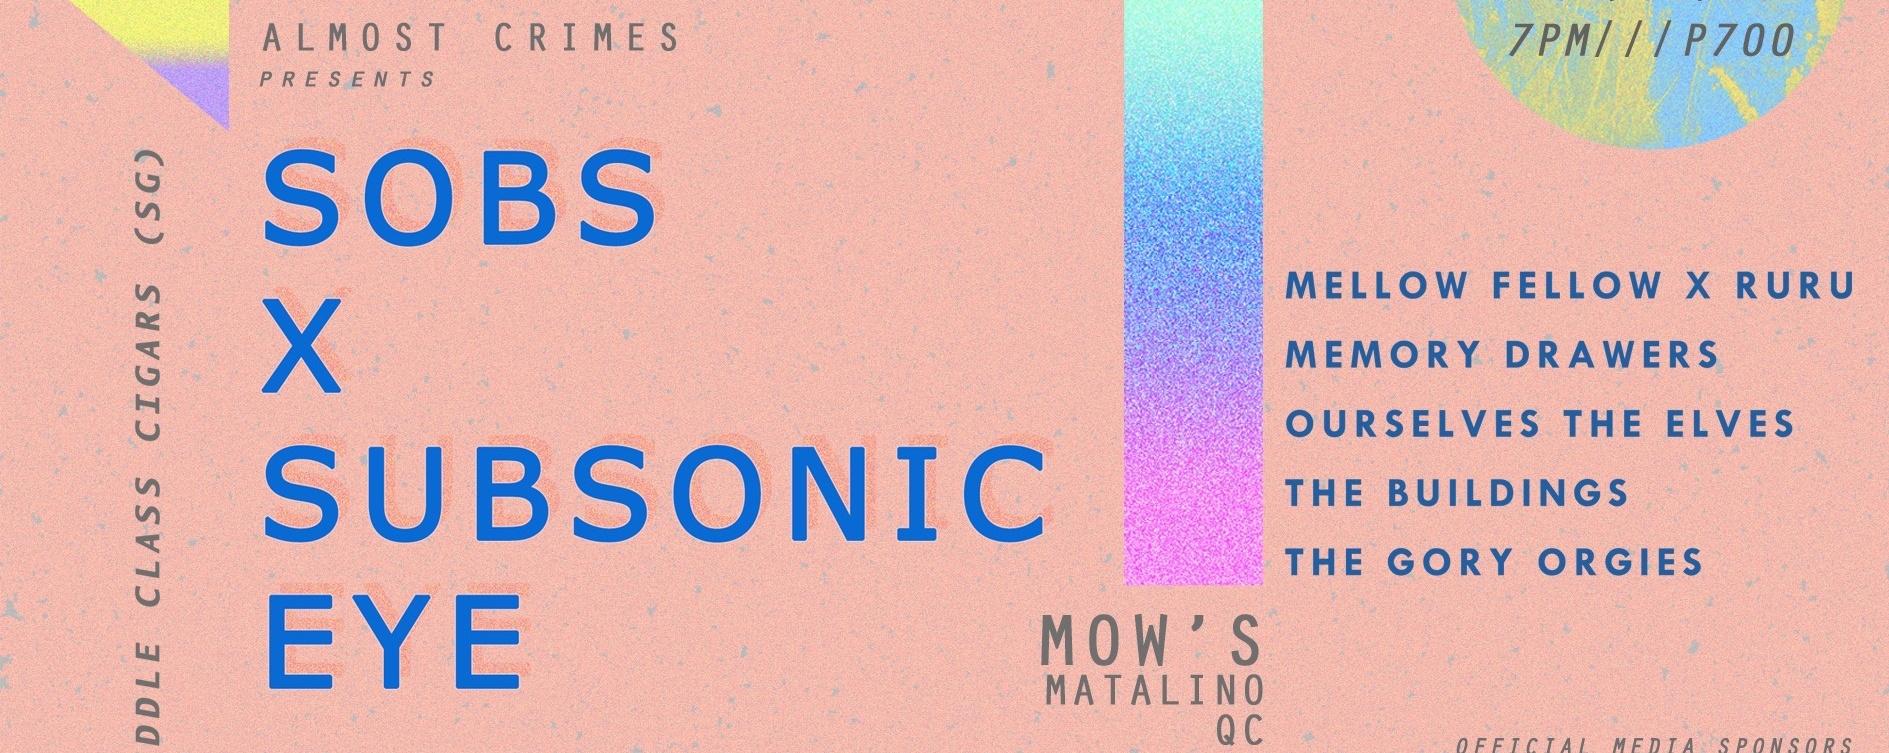 Sobs x Subsonic Eye (SG) Live in Manila